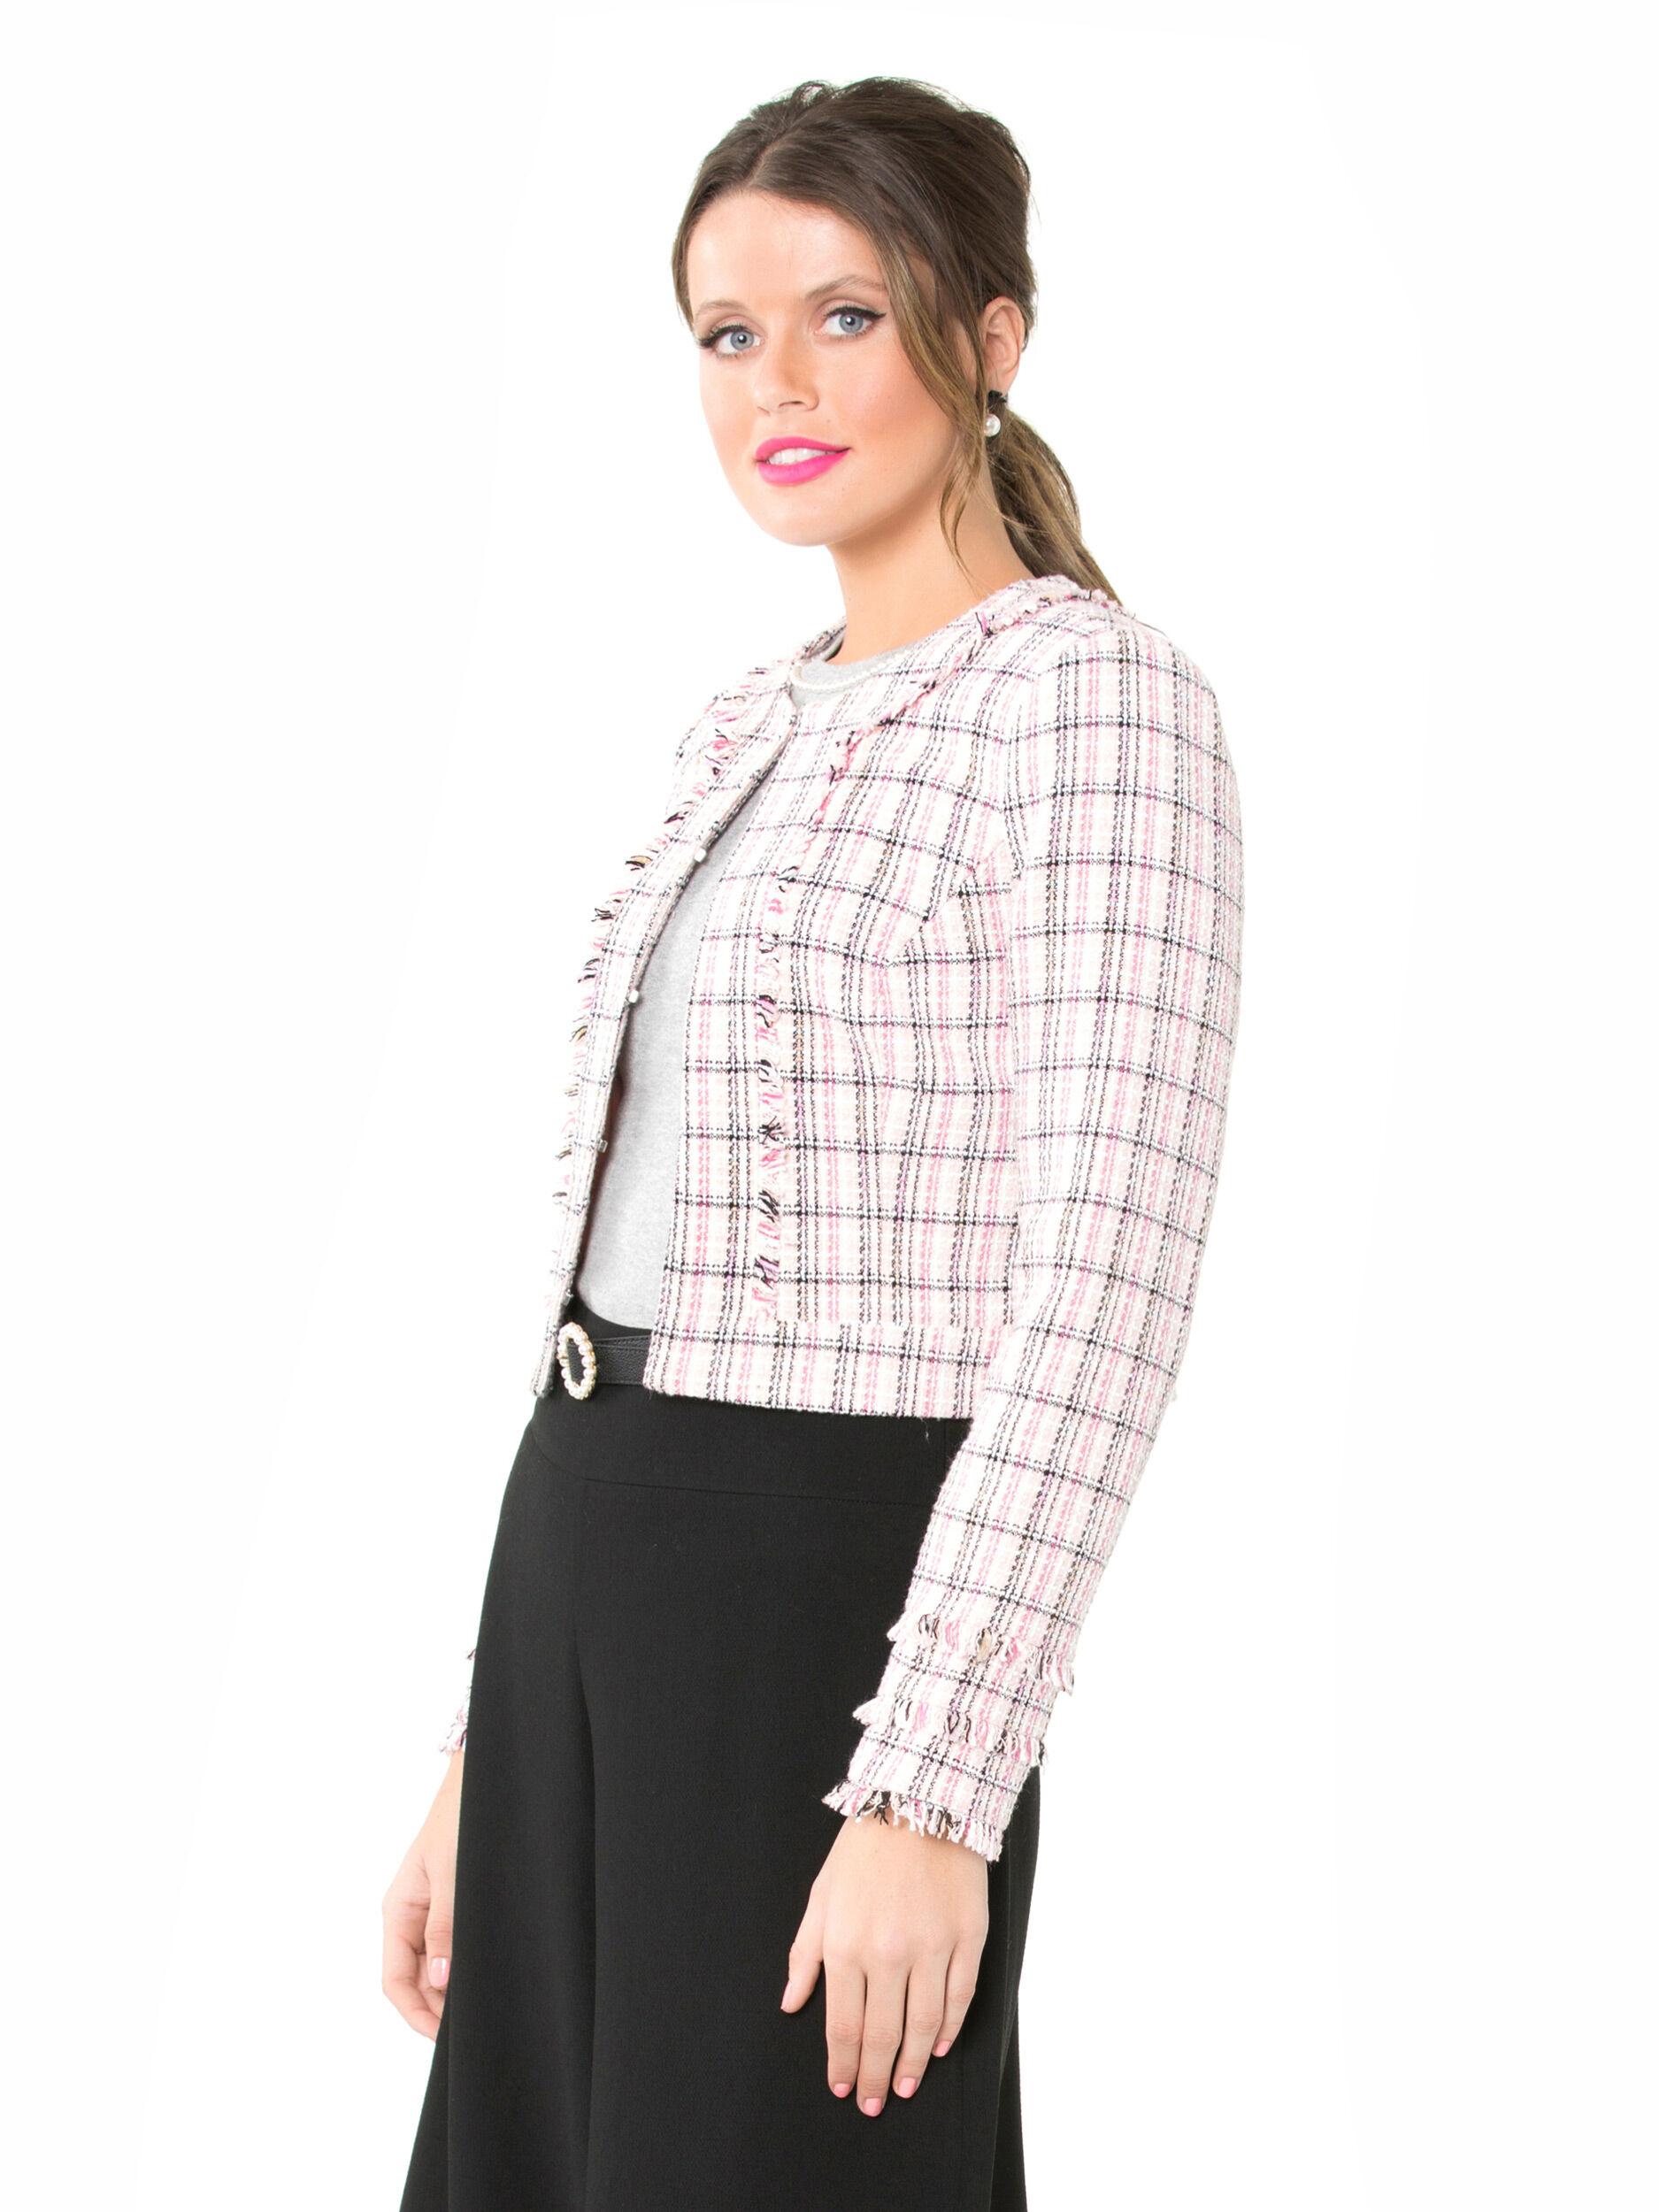 Uptown Girl Jacket